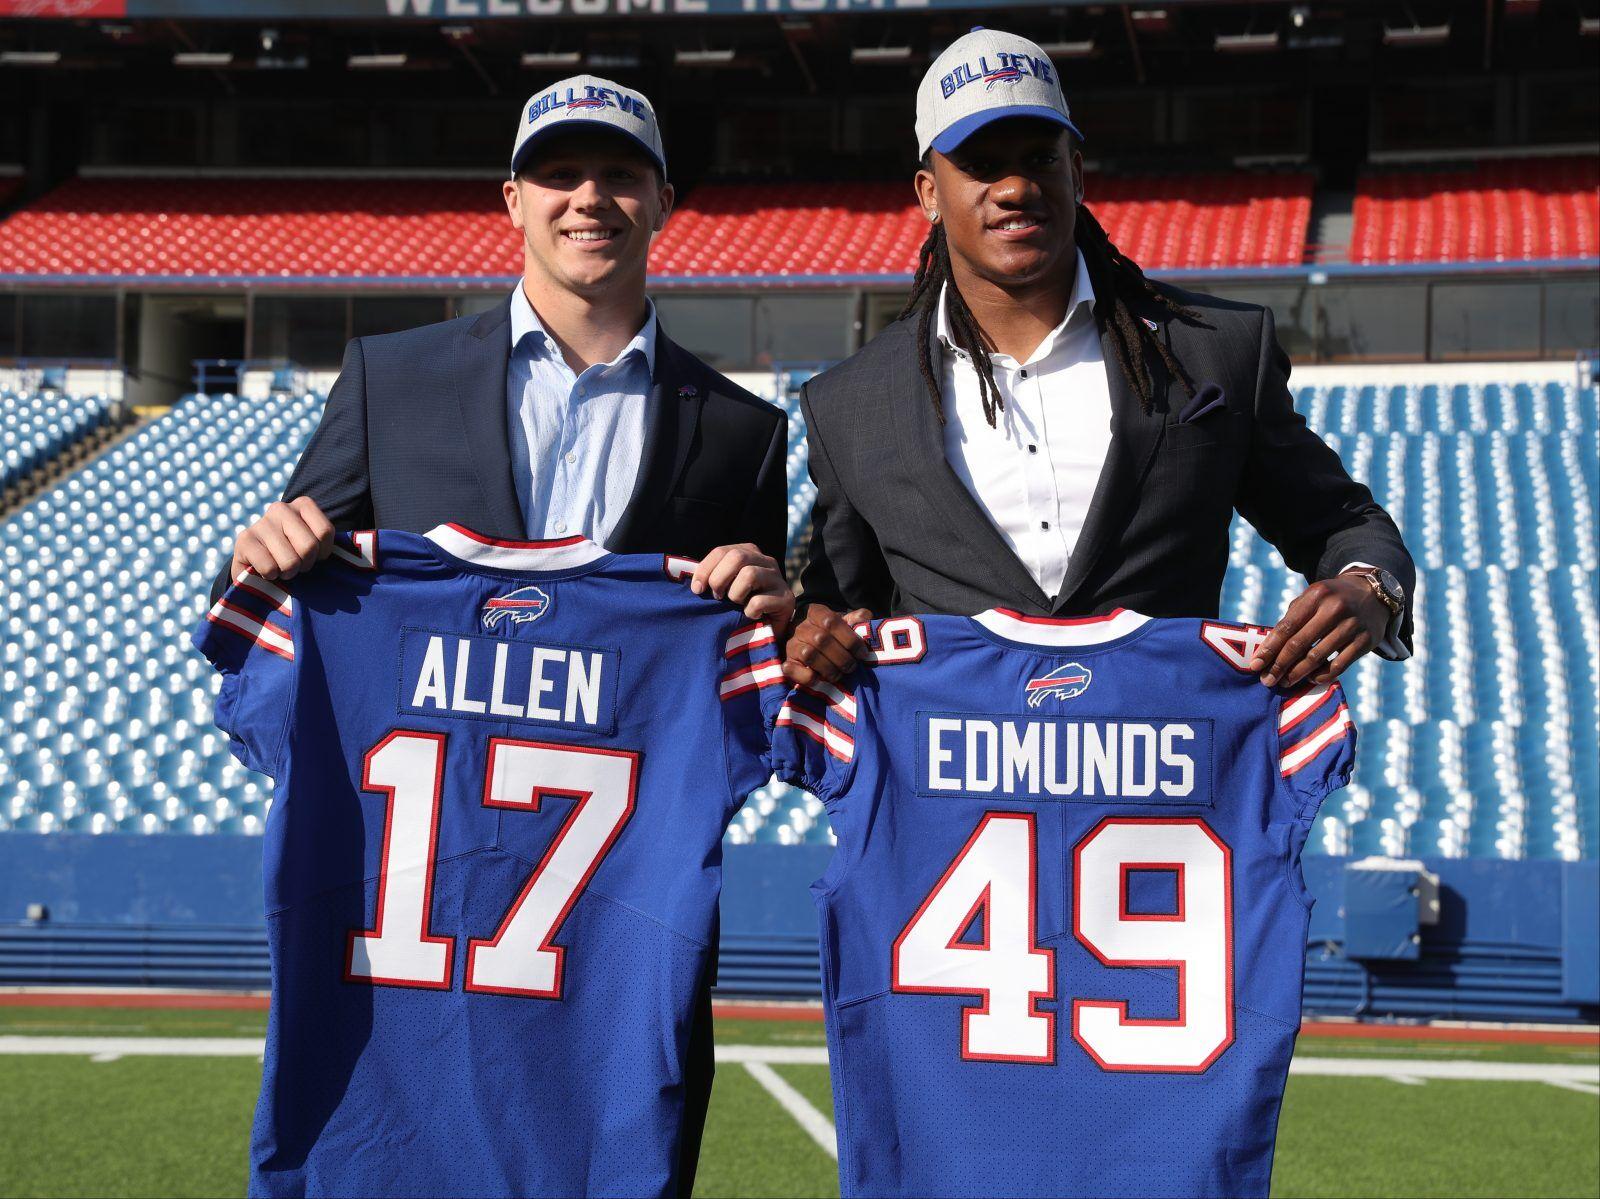 Bills' draft picks get their jersey numbers   Buffalo Bills News ...